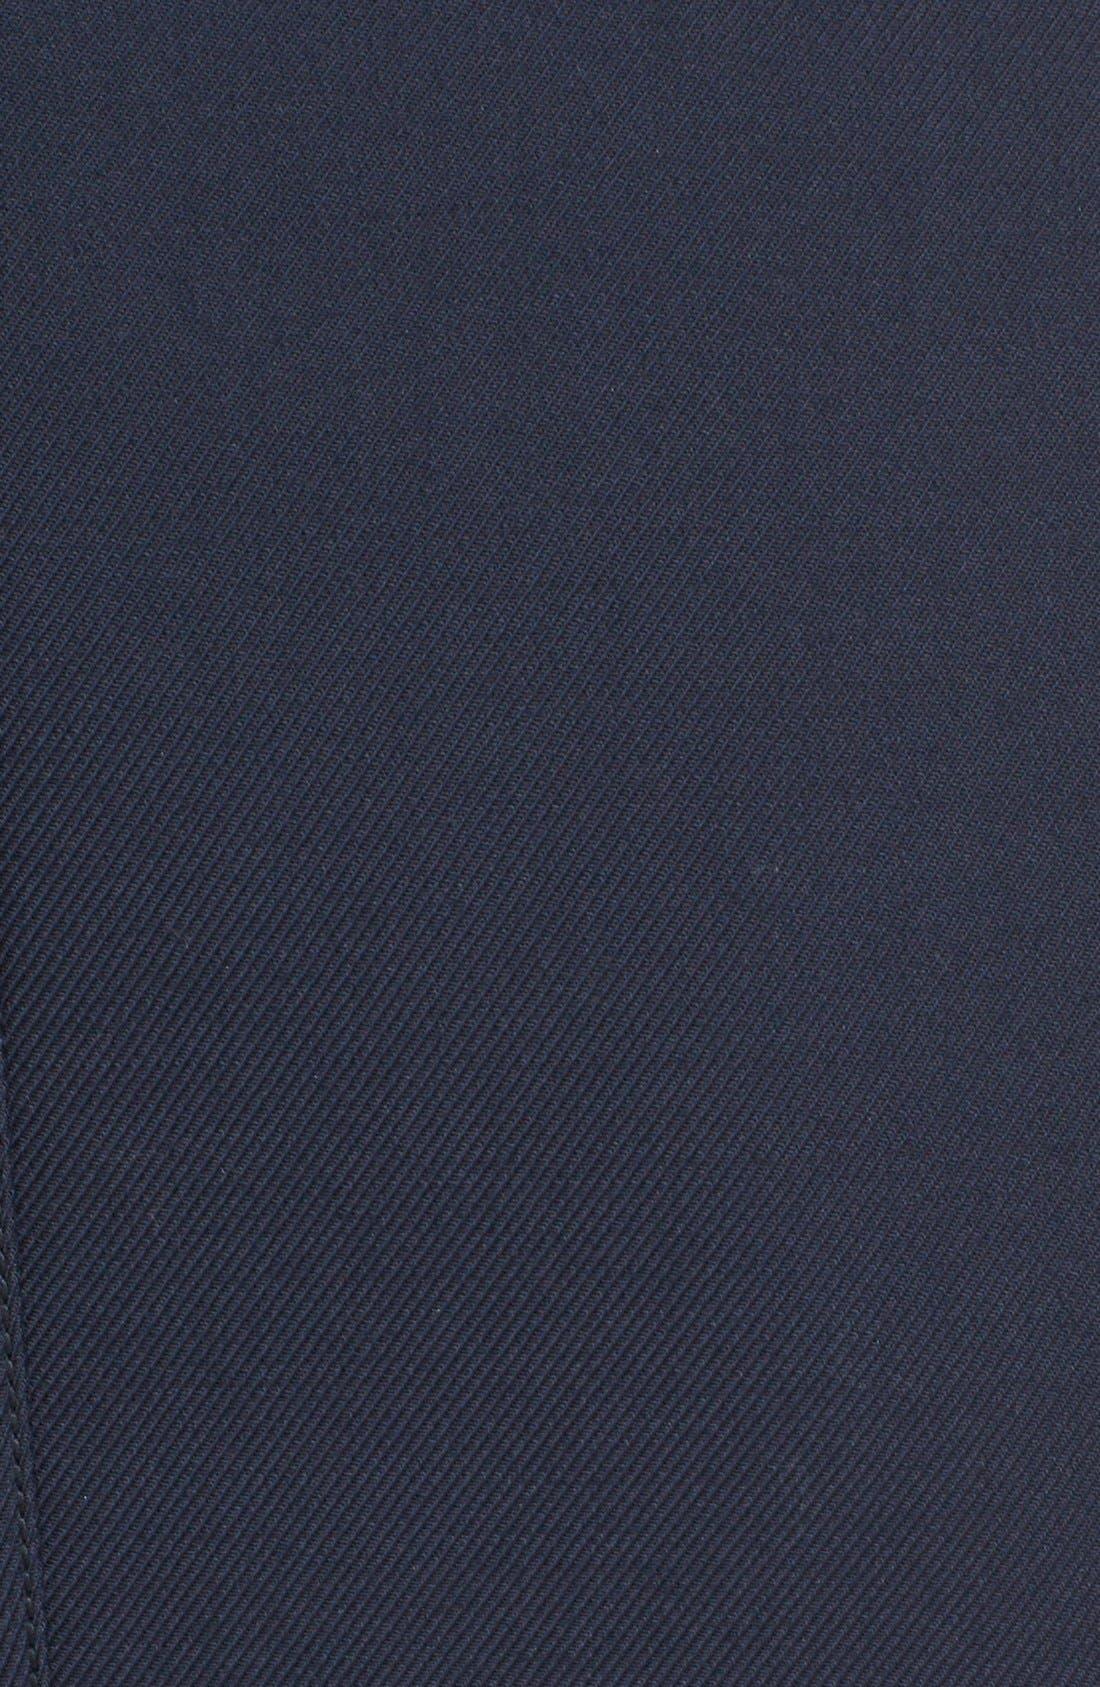 Alternate Image 3  - Burberry 'Drumfield' Twill Coat